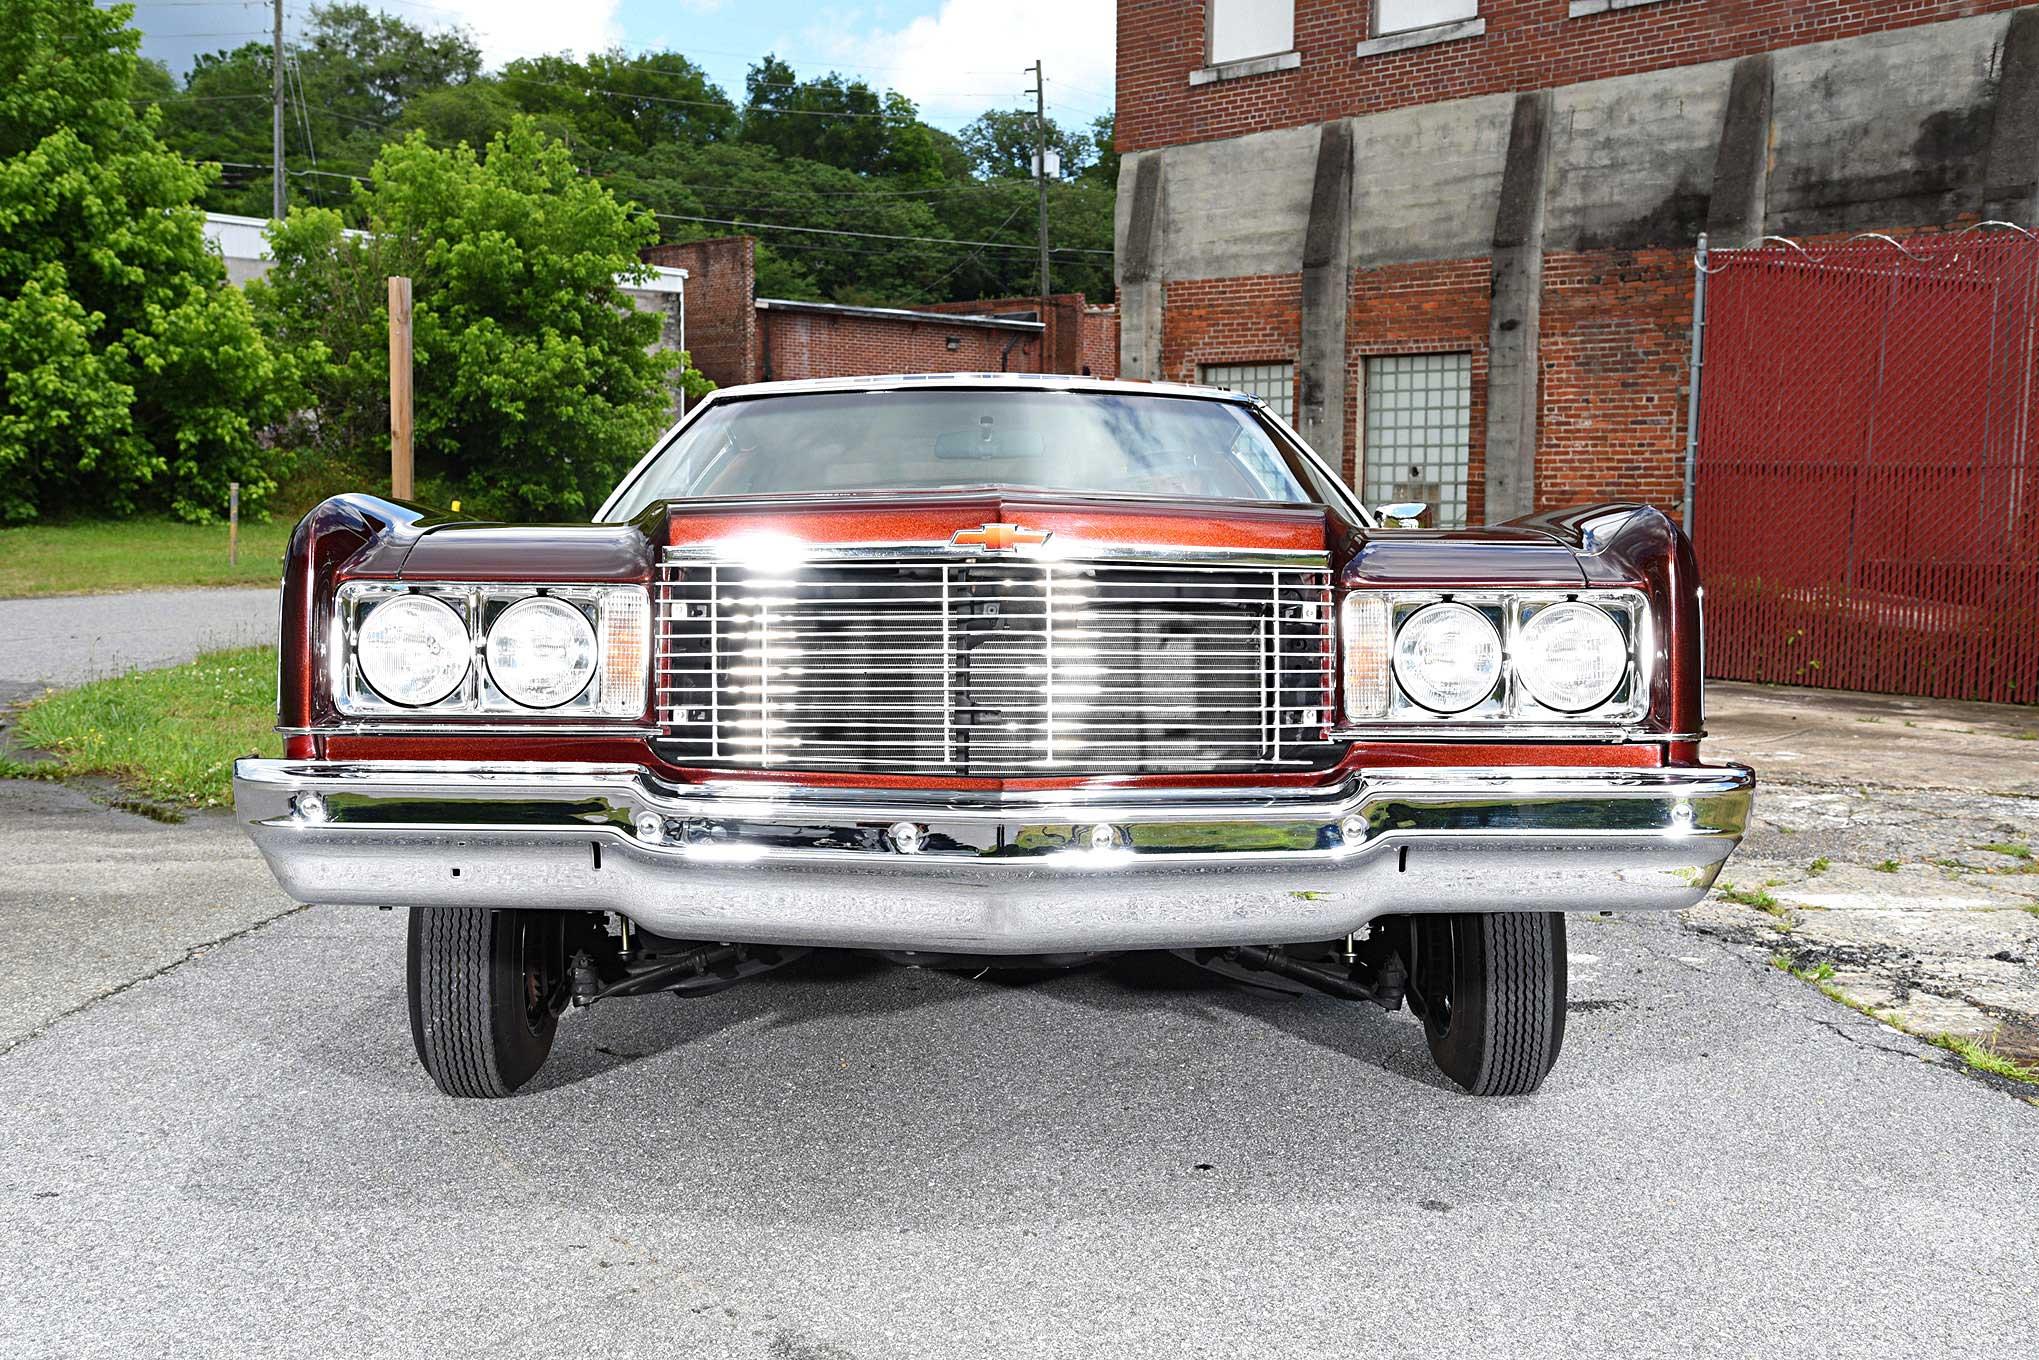 1975 Chevrolet Impala Glasshouse Front End Lowrider